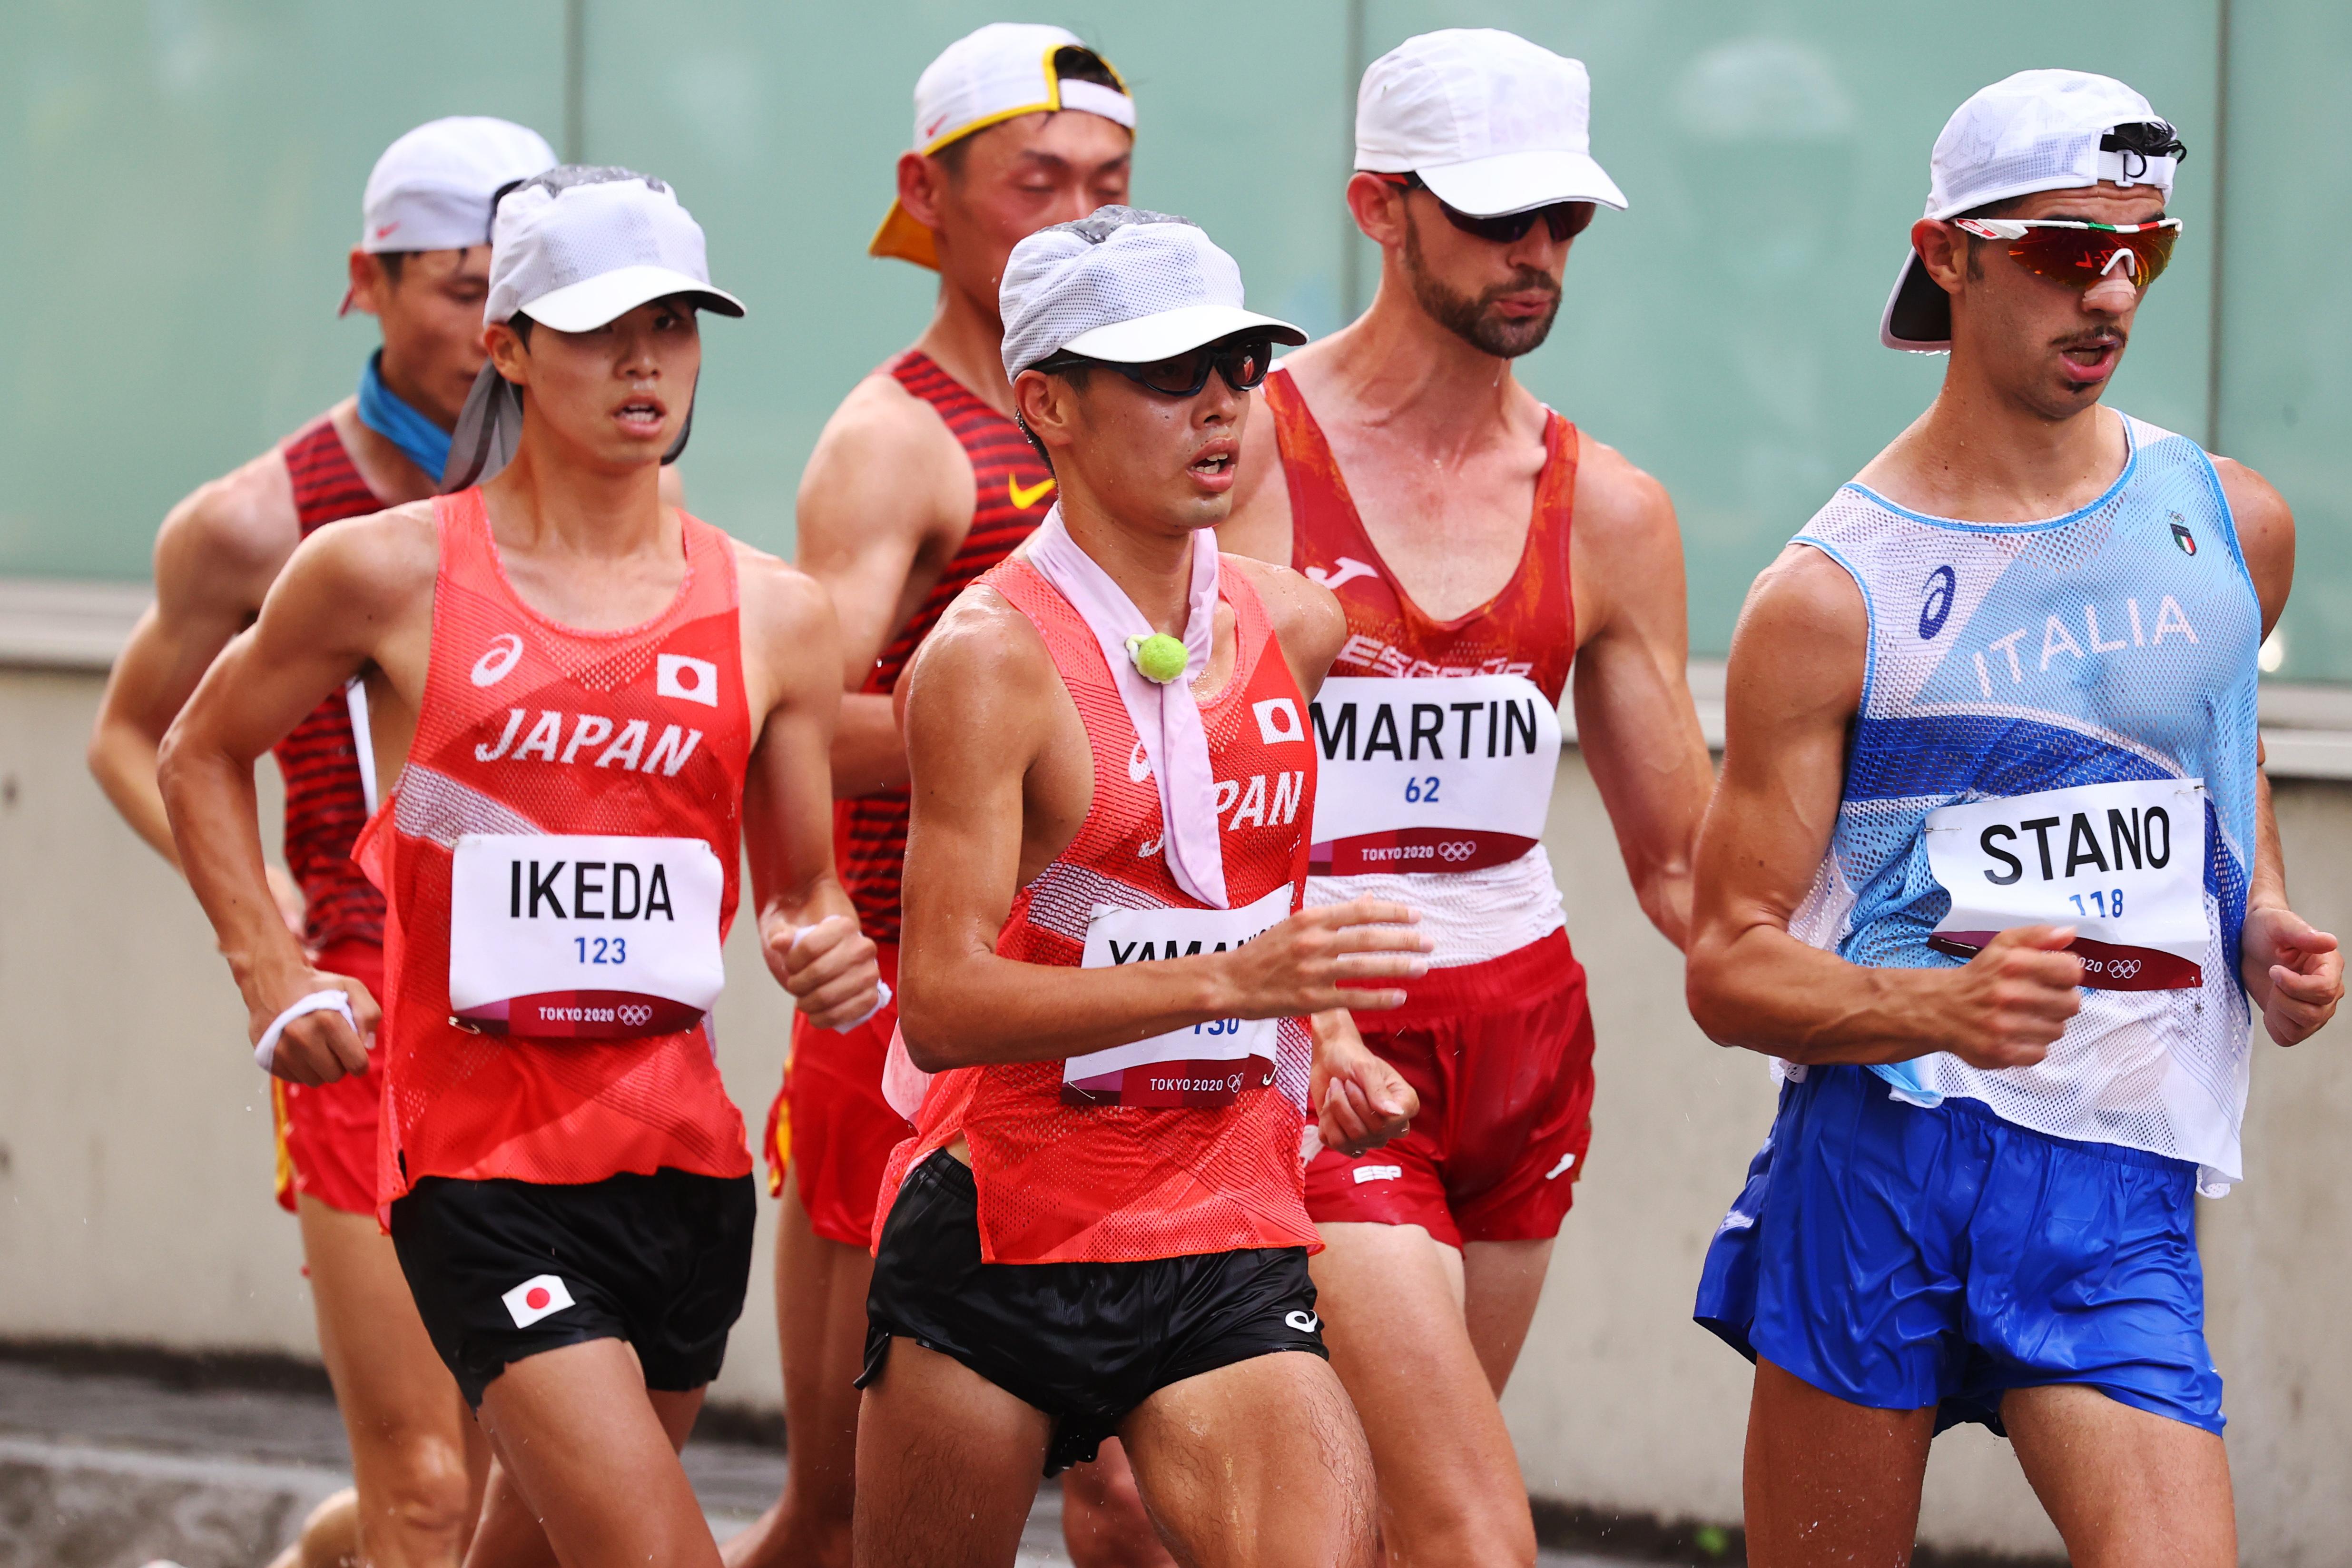 Tokyo 2020 Olympics - Athletics - Men's 20km Walk - Sapporo Odori Park, Sapporo, Japan - August 5, 2021. Koki Ikeda of Japan, Toshikazu Yamanishi of Japan and Massimo Stano of Italy in action during competing REUTERS/Kim Hong-Ji